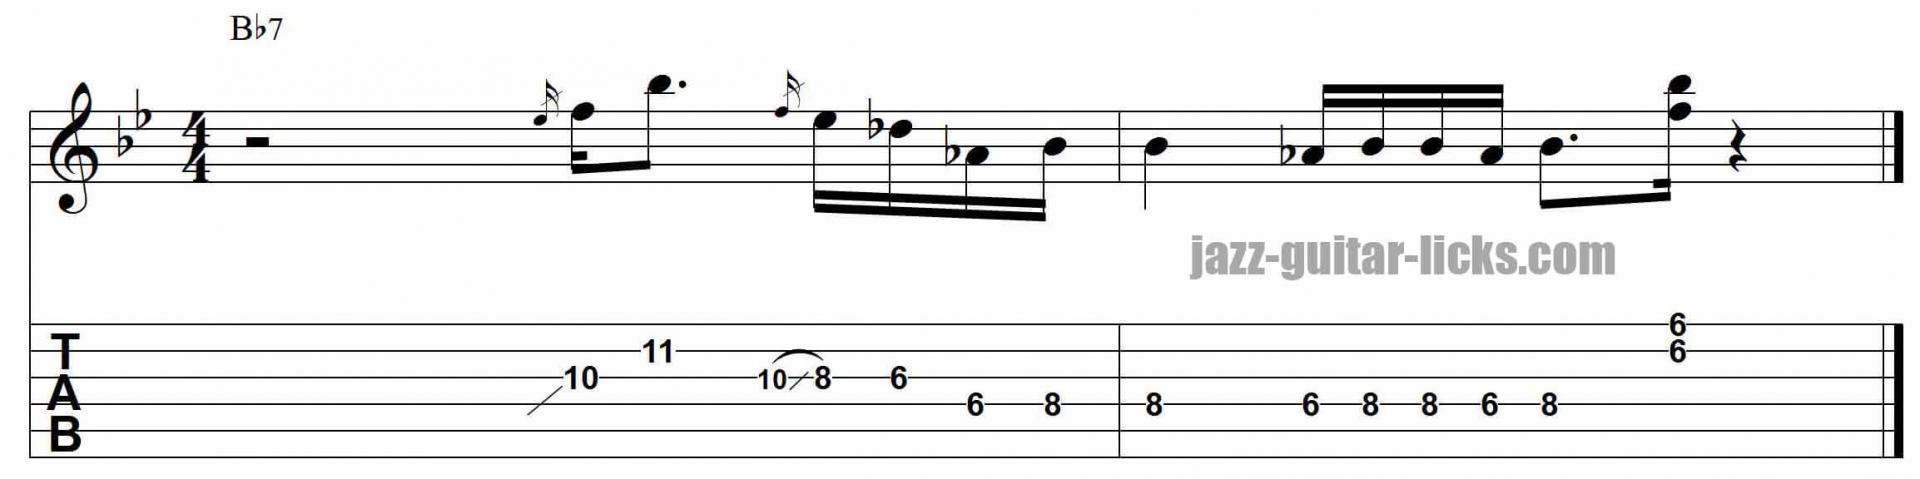 Soul jazz minor pentatonic guitar lick